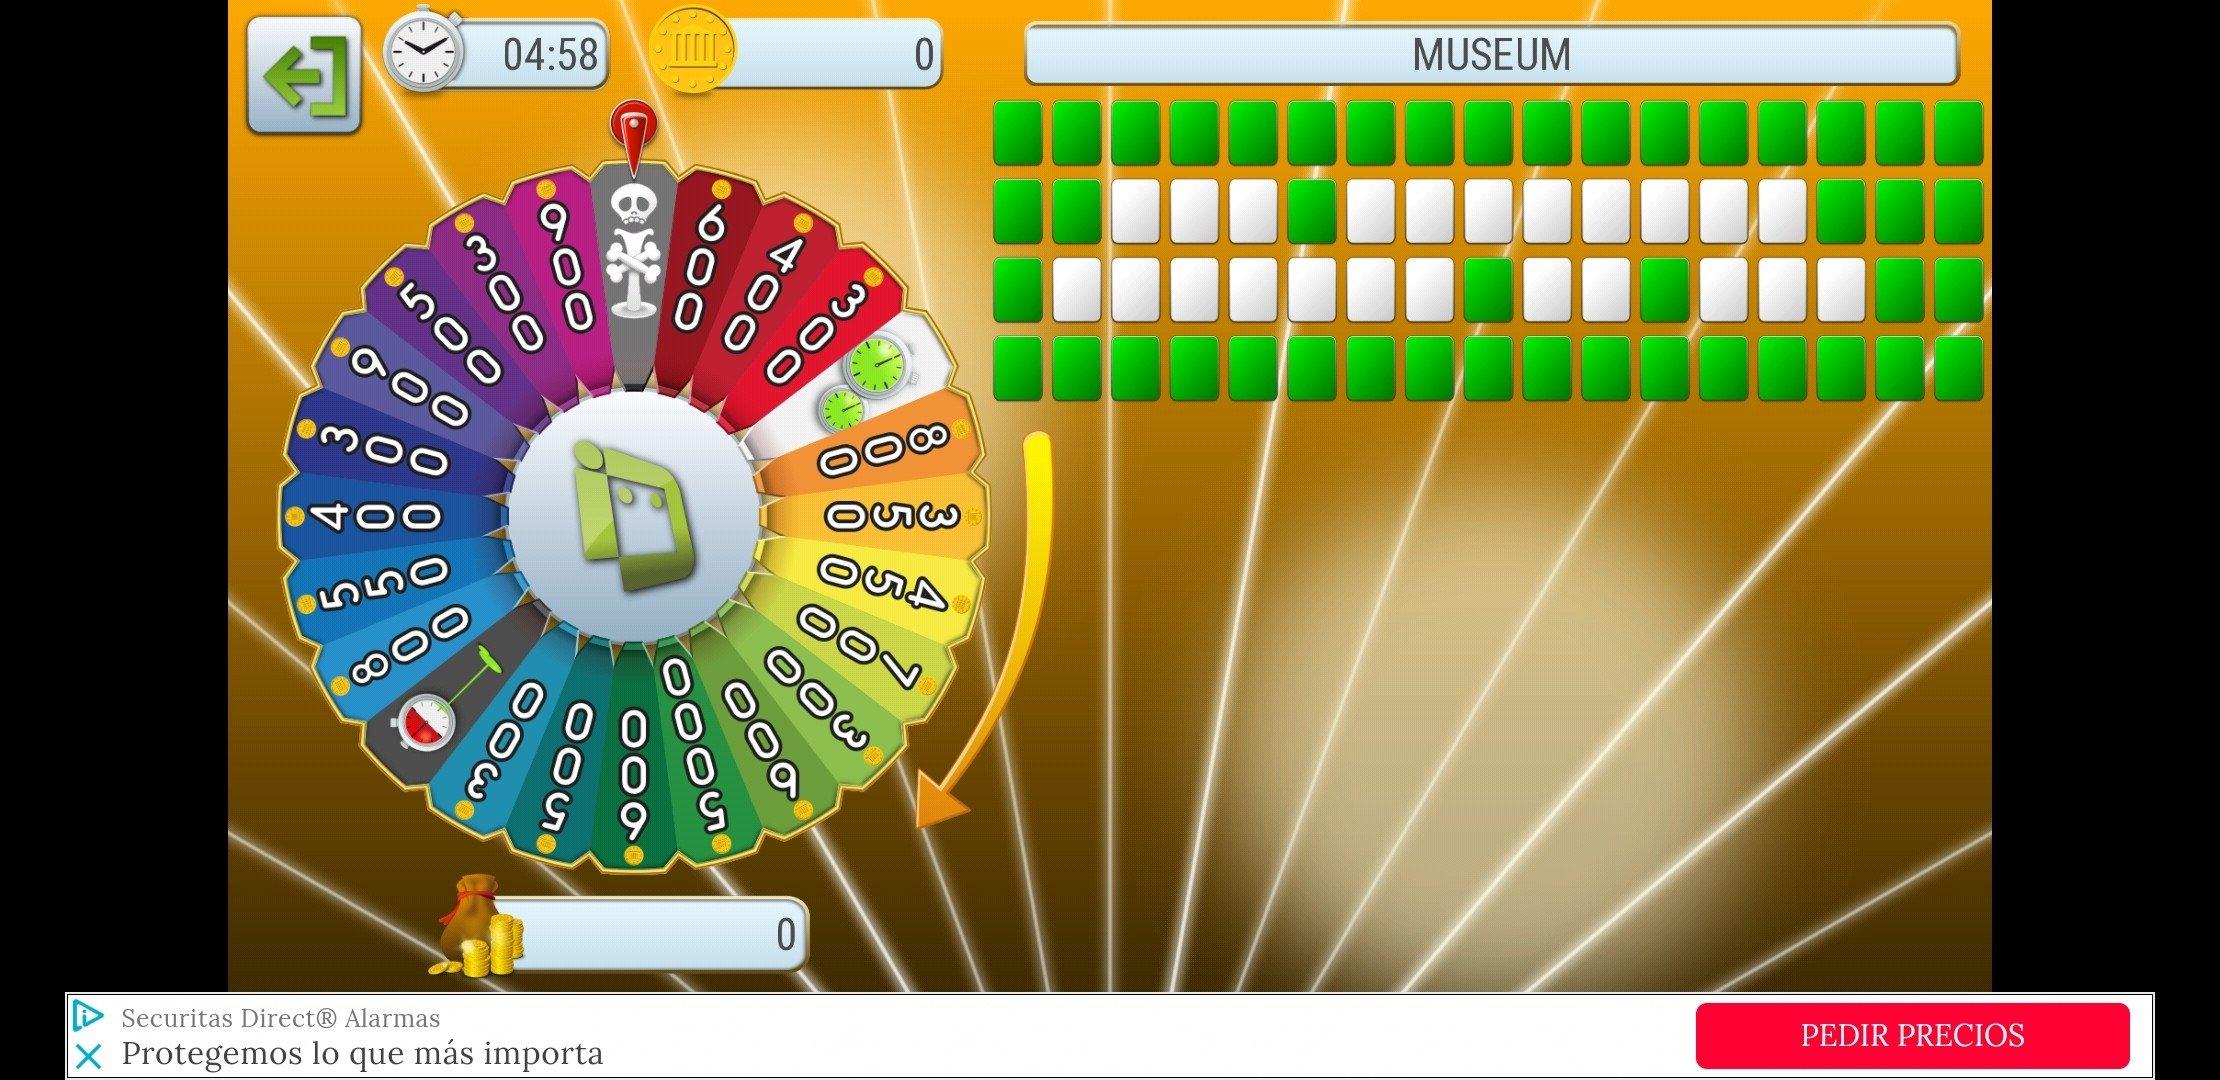 Reto betcris juegos de casino gratis Tenerife-506935